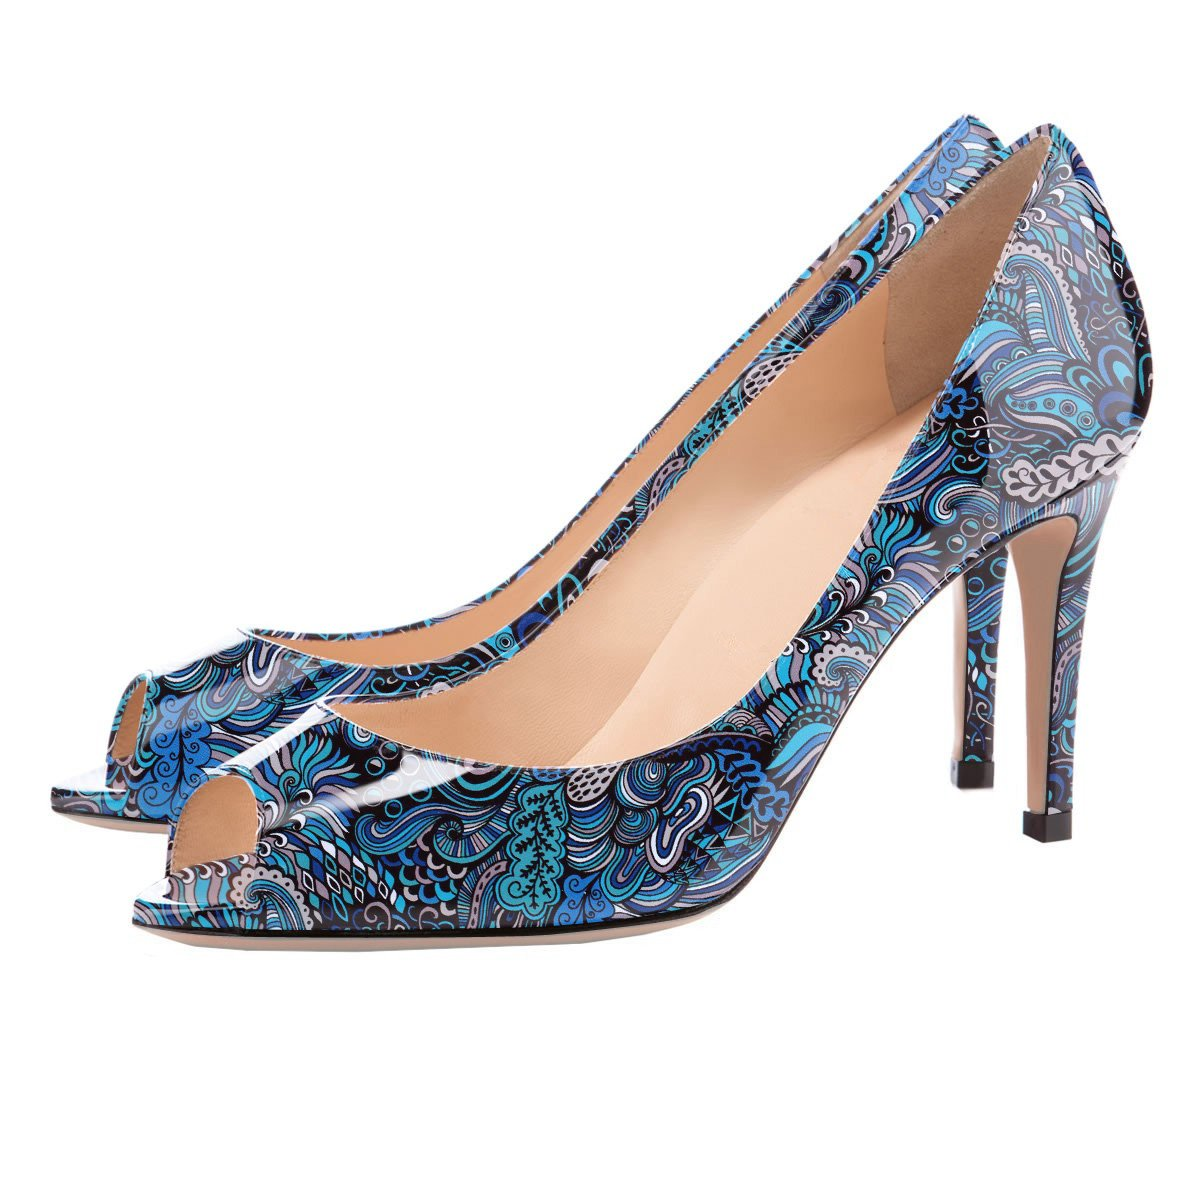 Eldof Women Peep Toe Pumps Mid-Heel Pumps Formal Open Wedding Bridal Classic Heel Open Formal Toe Stiletto B07FHLK2M1 10.5 B(M) US|Blue-pattern d3c593